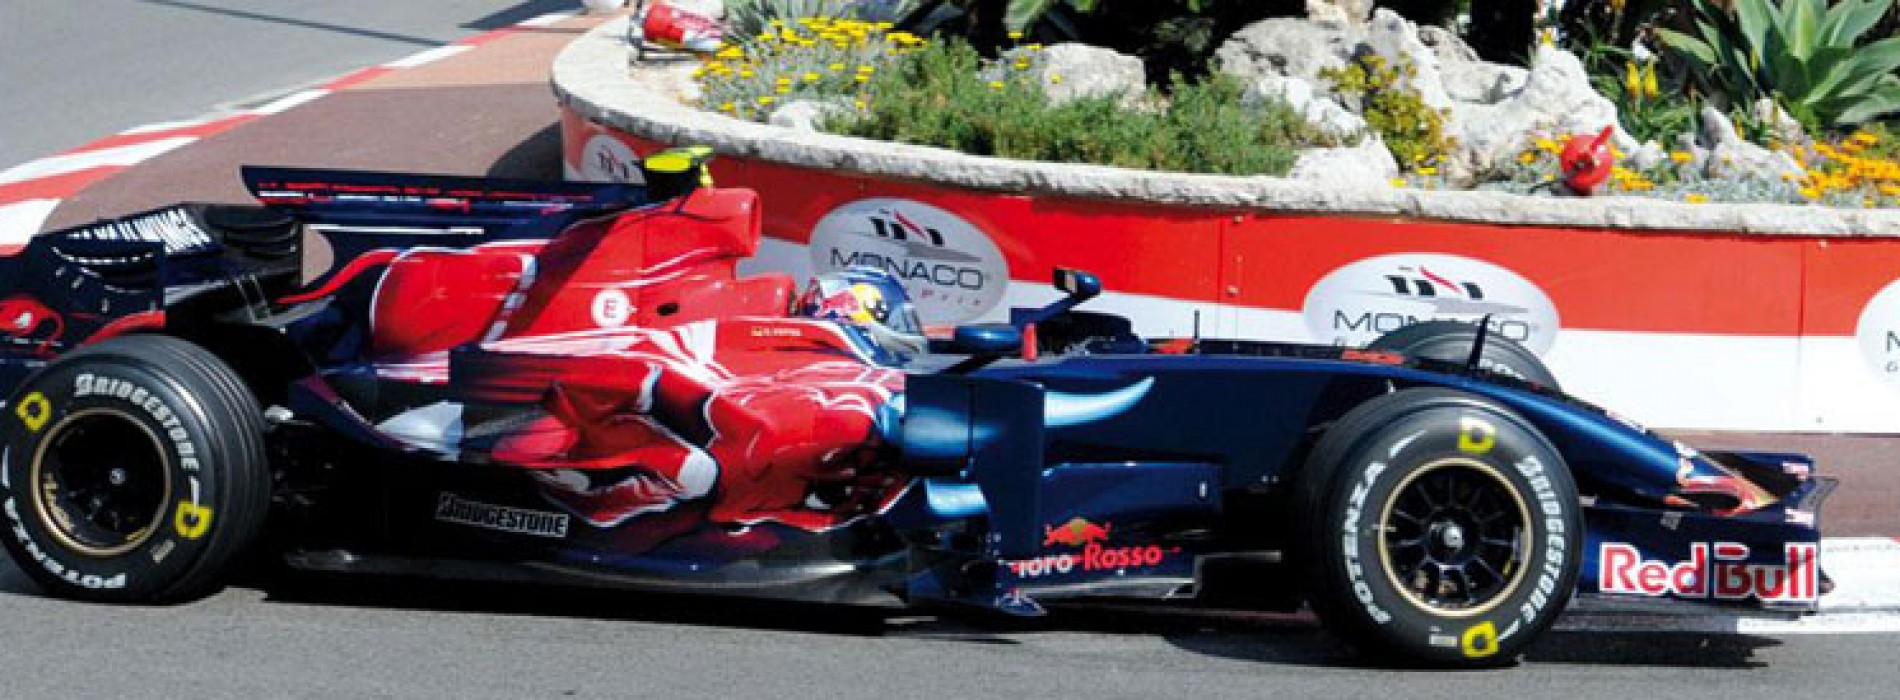 Monaco Grand Prix, An Exceptional Location of Glamour and Prestige